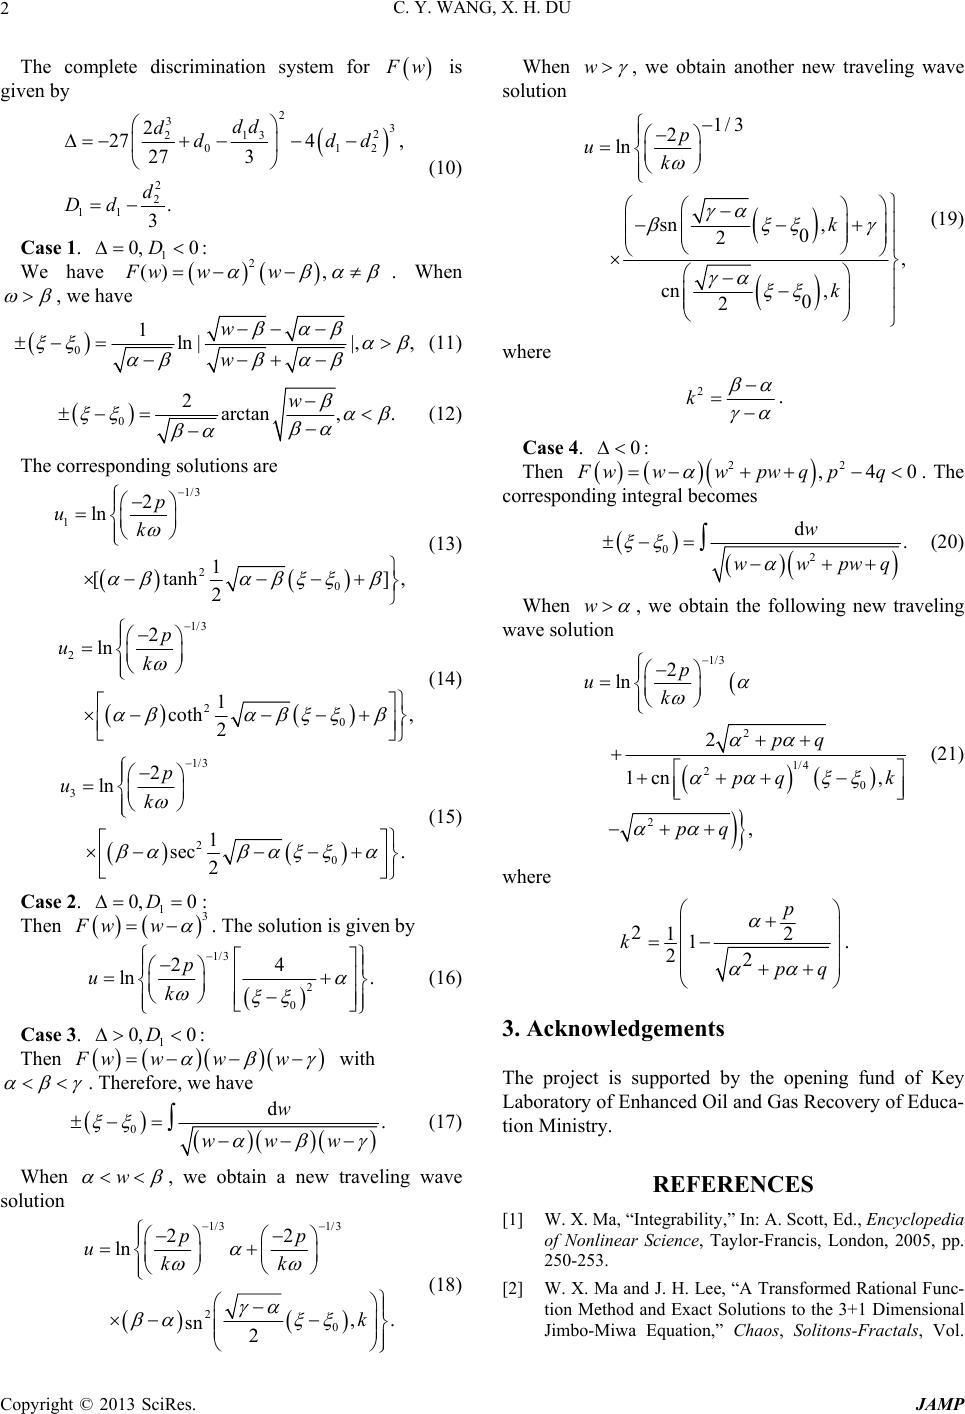 �9��^�K��kK.��.Y��_ClassifyingTravelingWaveSolutionstotheZhiber-ShabatEquation